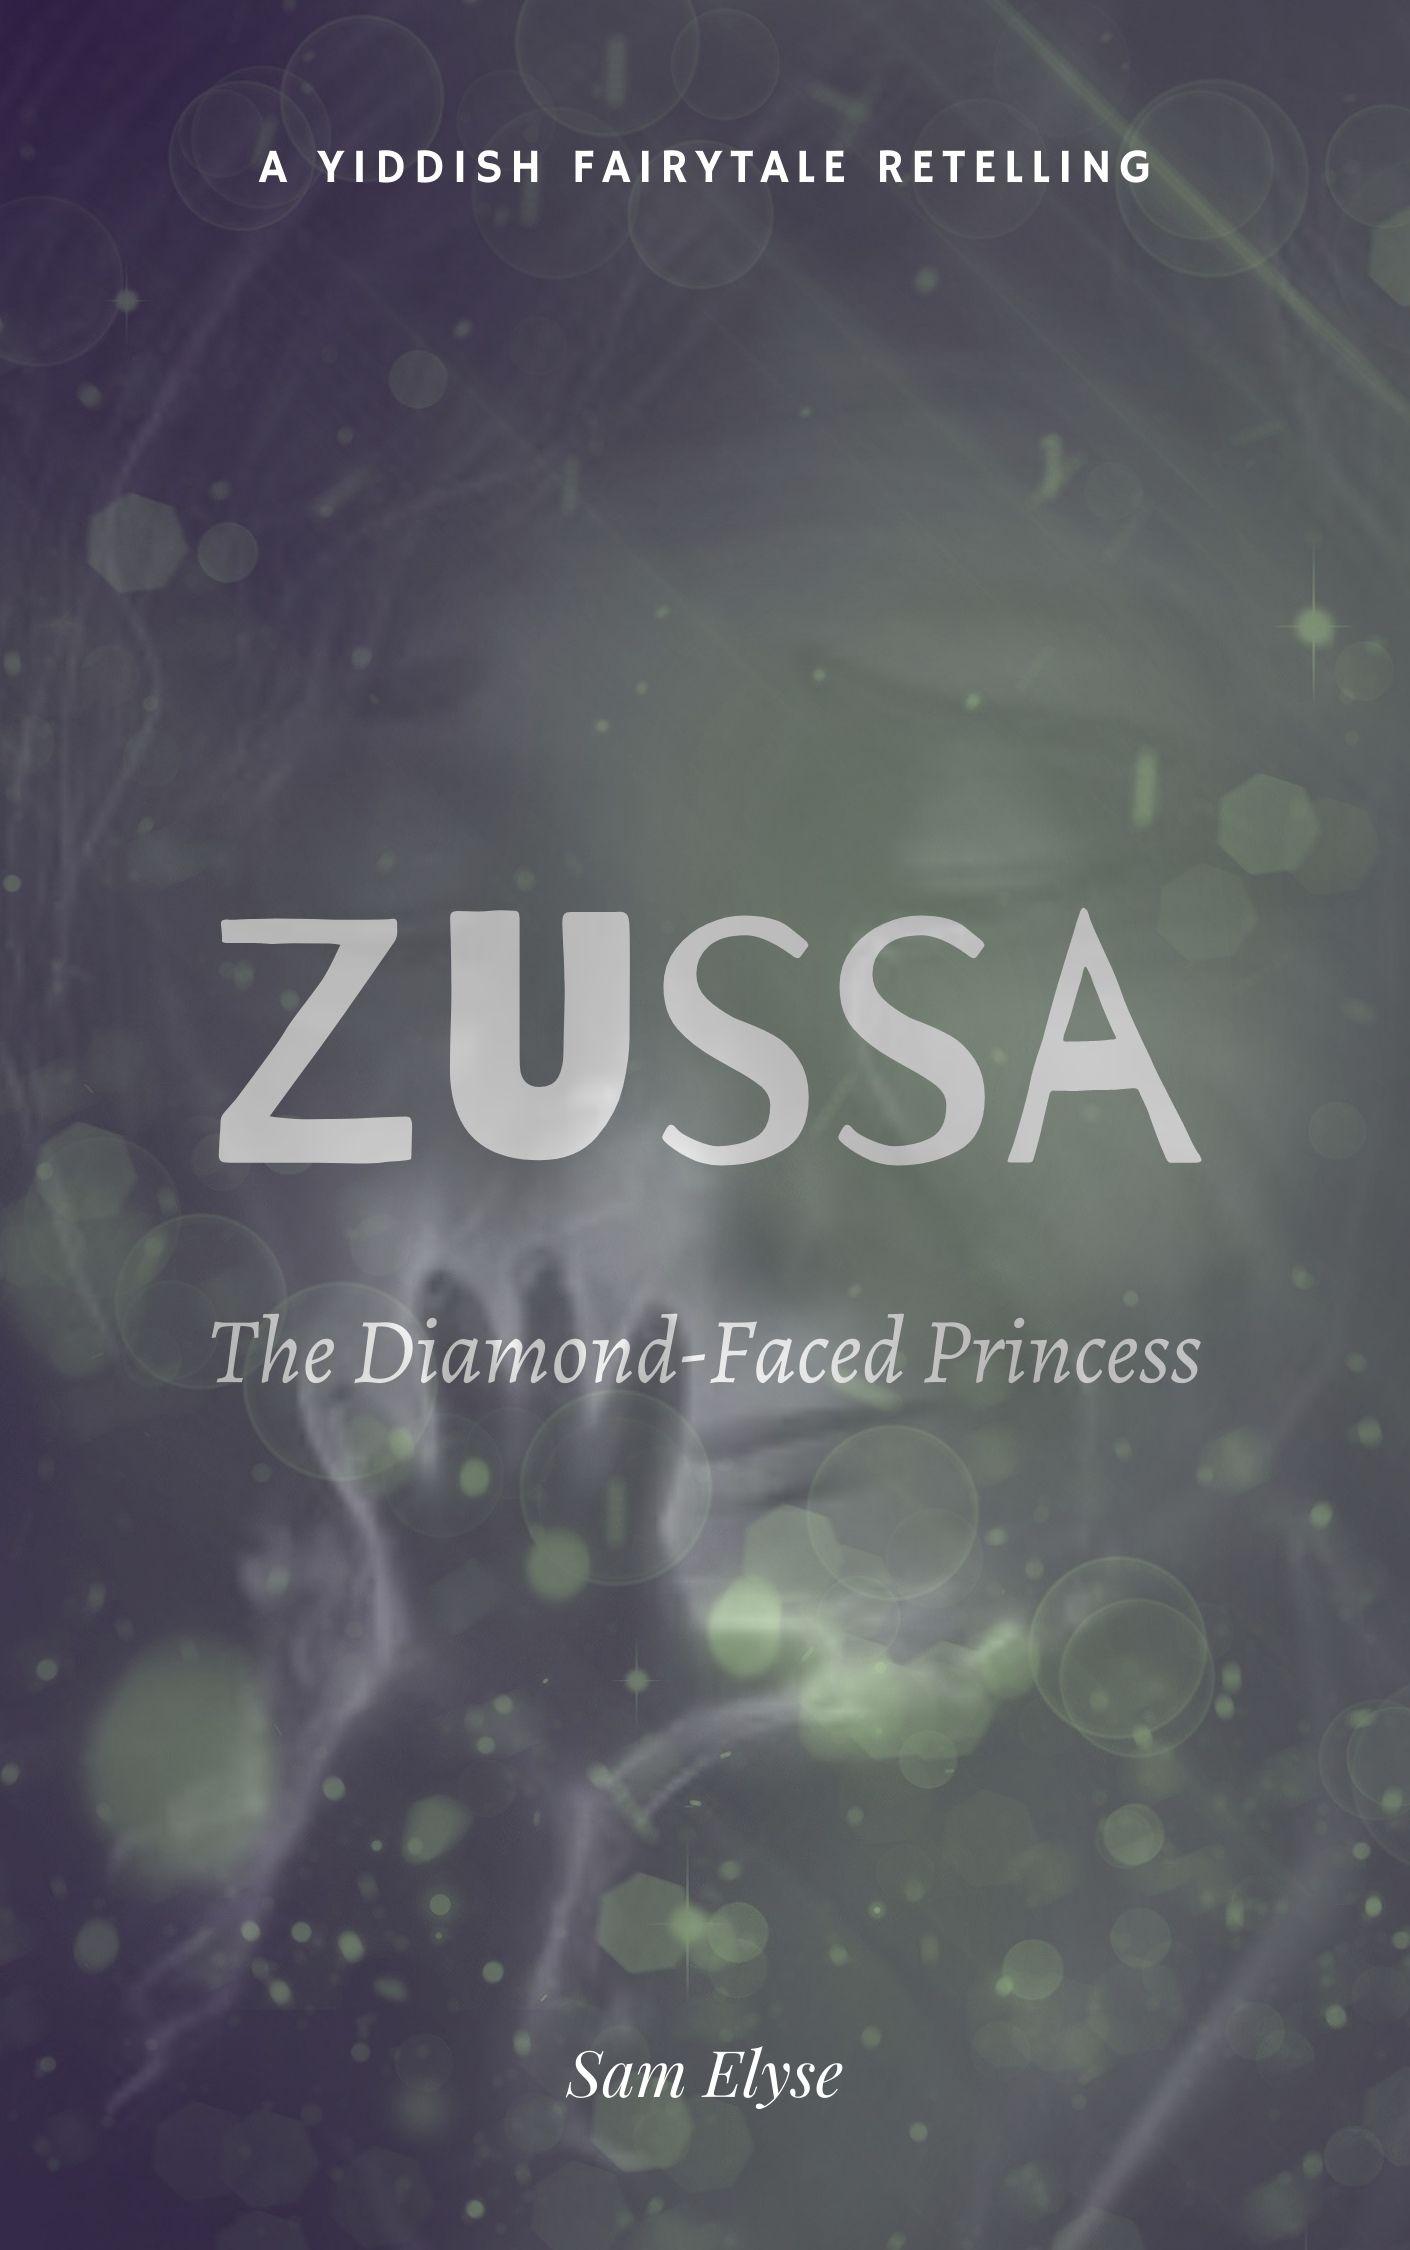 Zussa: The Diamond-Faced Princess